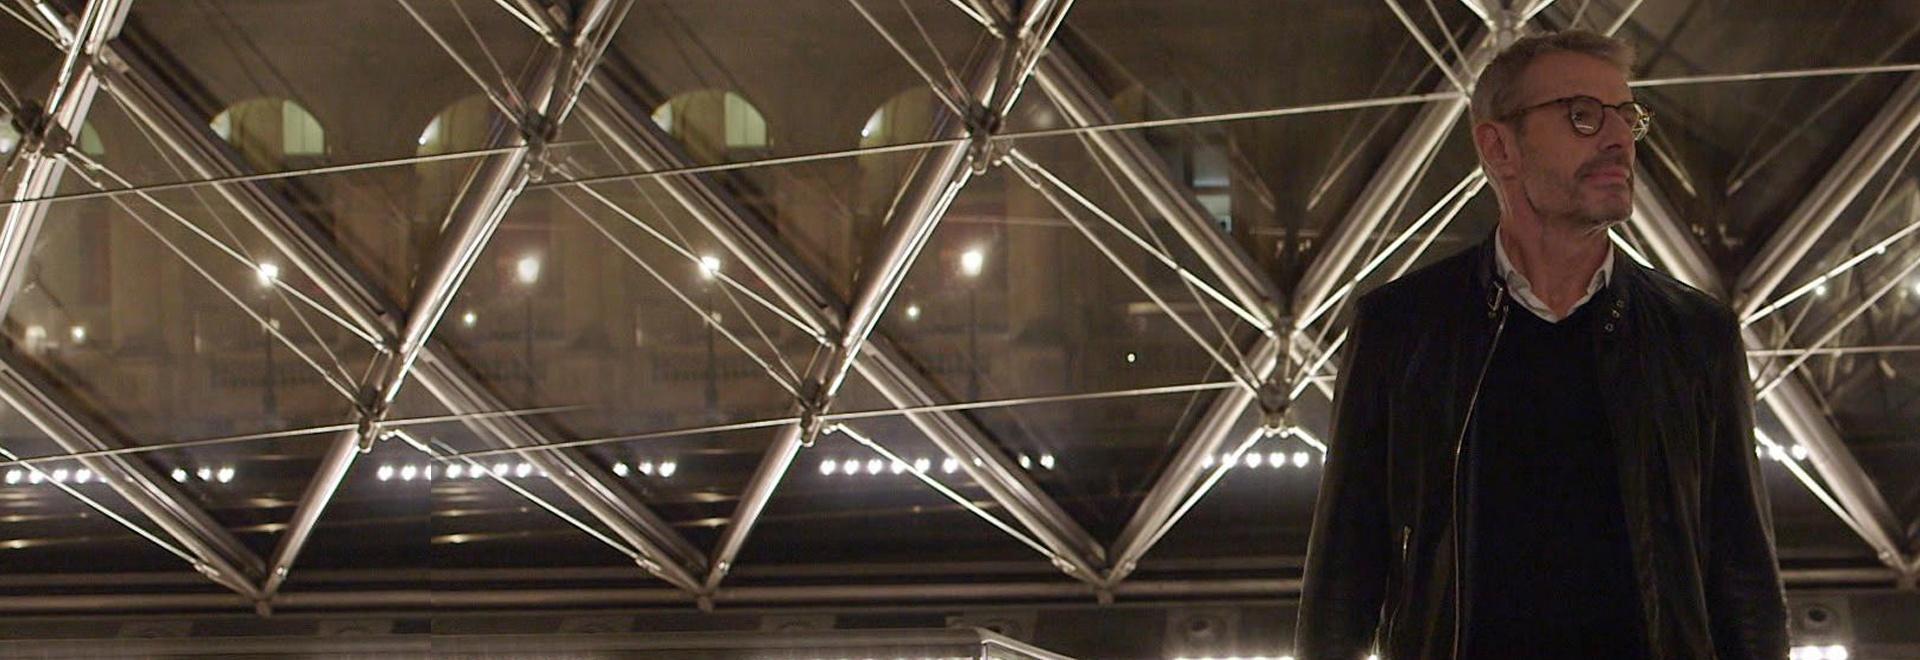 Una notte al Louvre con Lambert Wilson